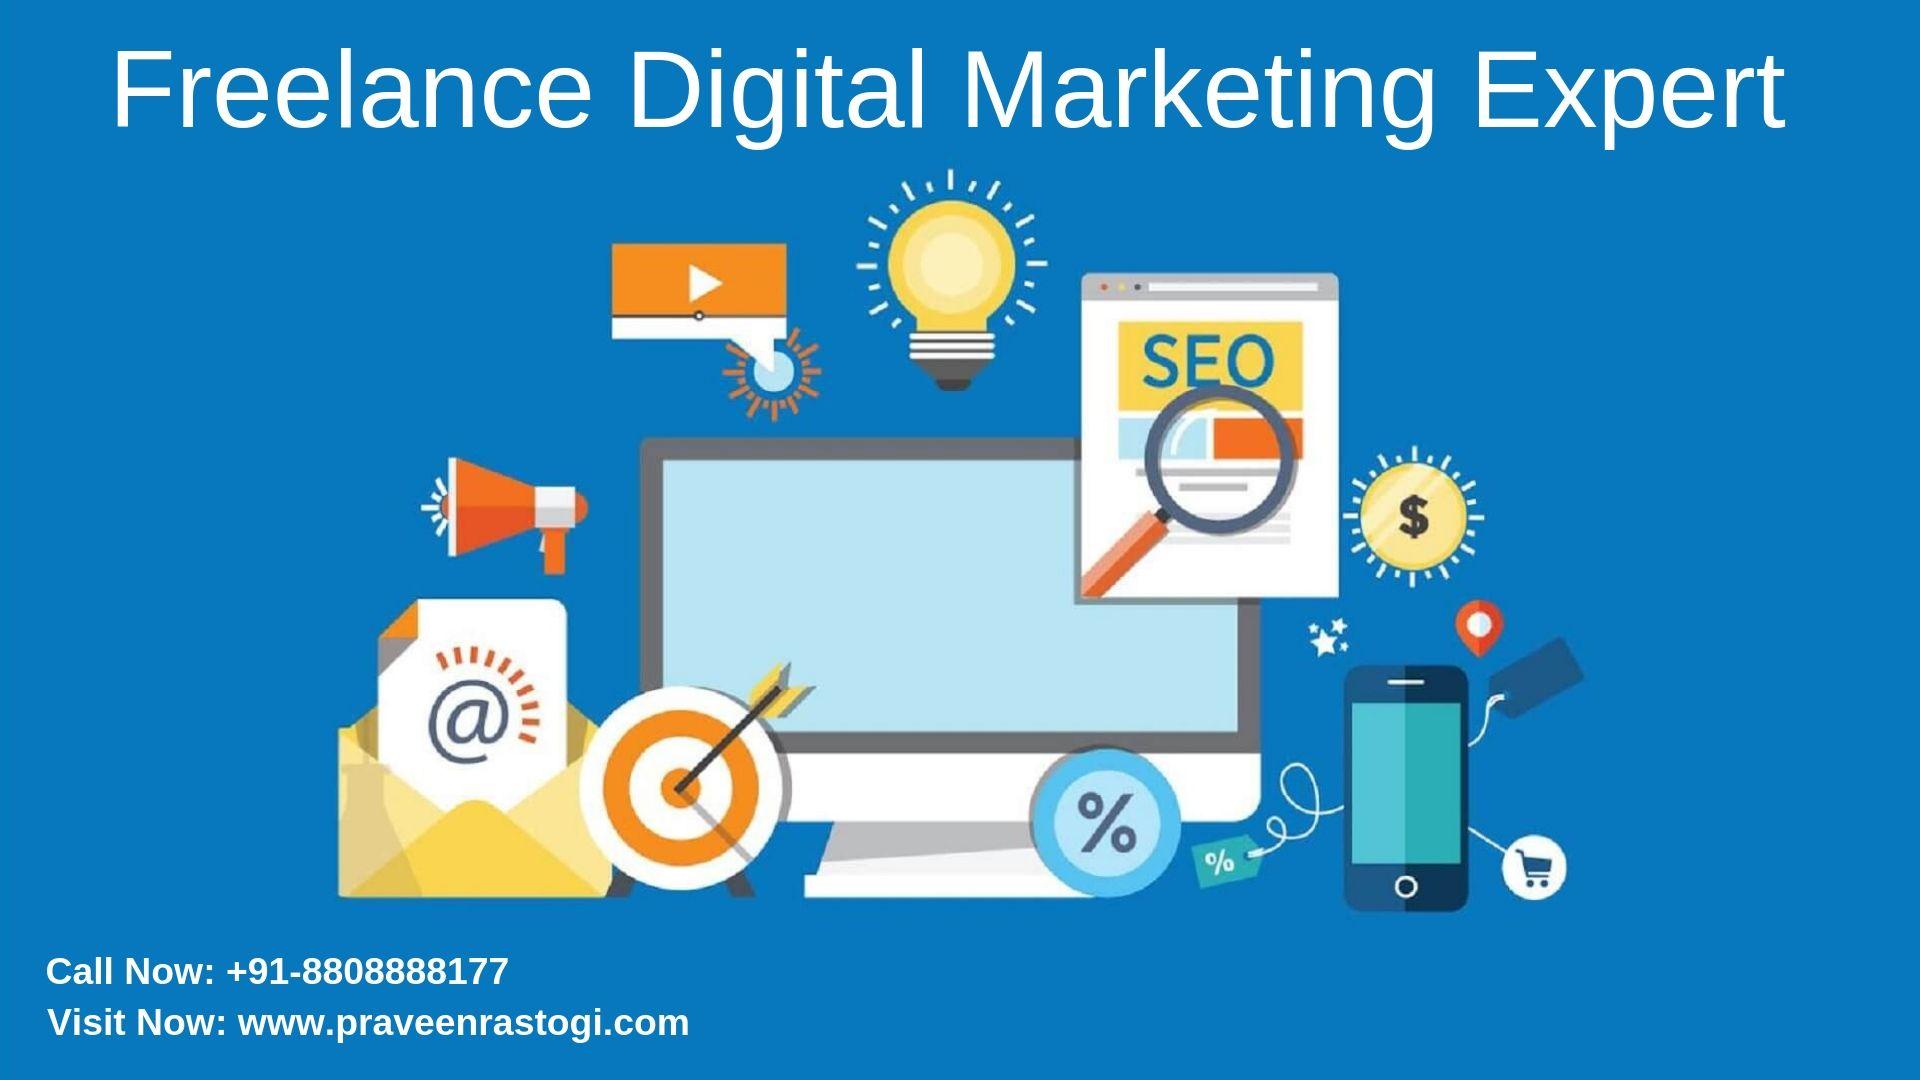 My Name Is Praveen Rastogi I Work As Freelance Digital Marketing Expert A Digital Marketing Strategy Digital Marketing Services Best Digital Marketing Company